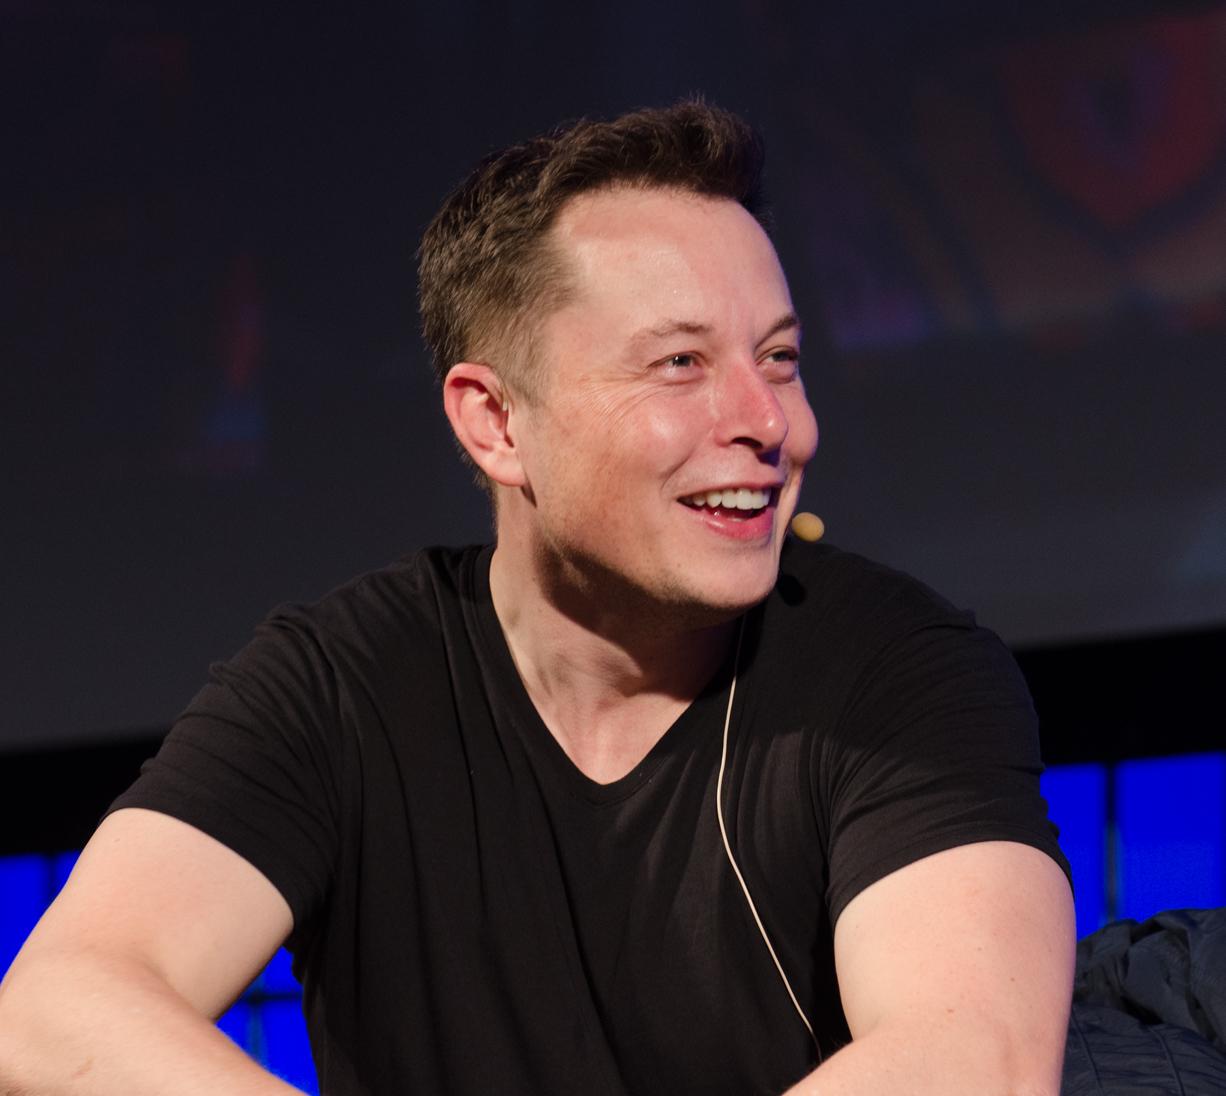 Tesla's Master Plan Includes Commercial Trucks